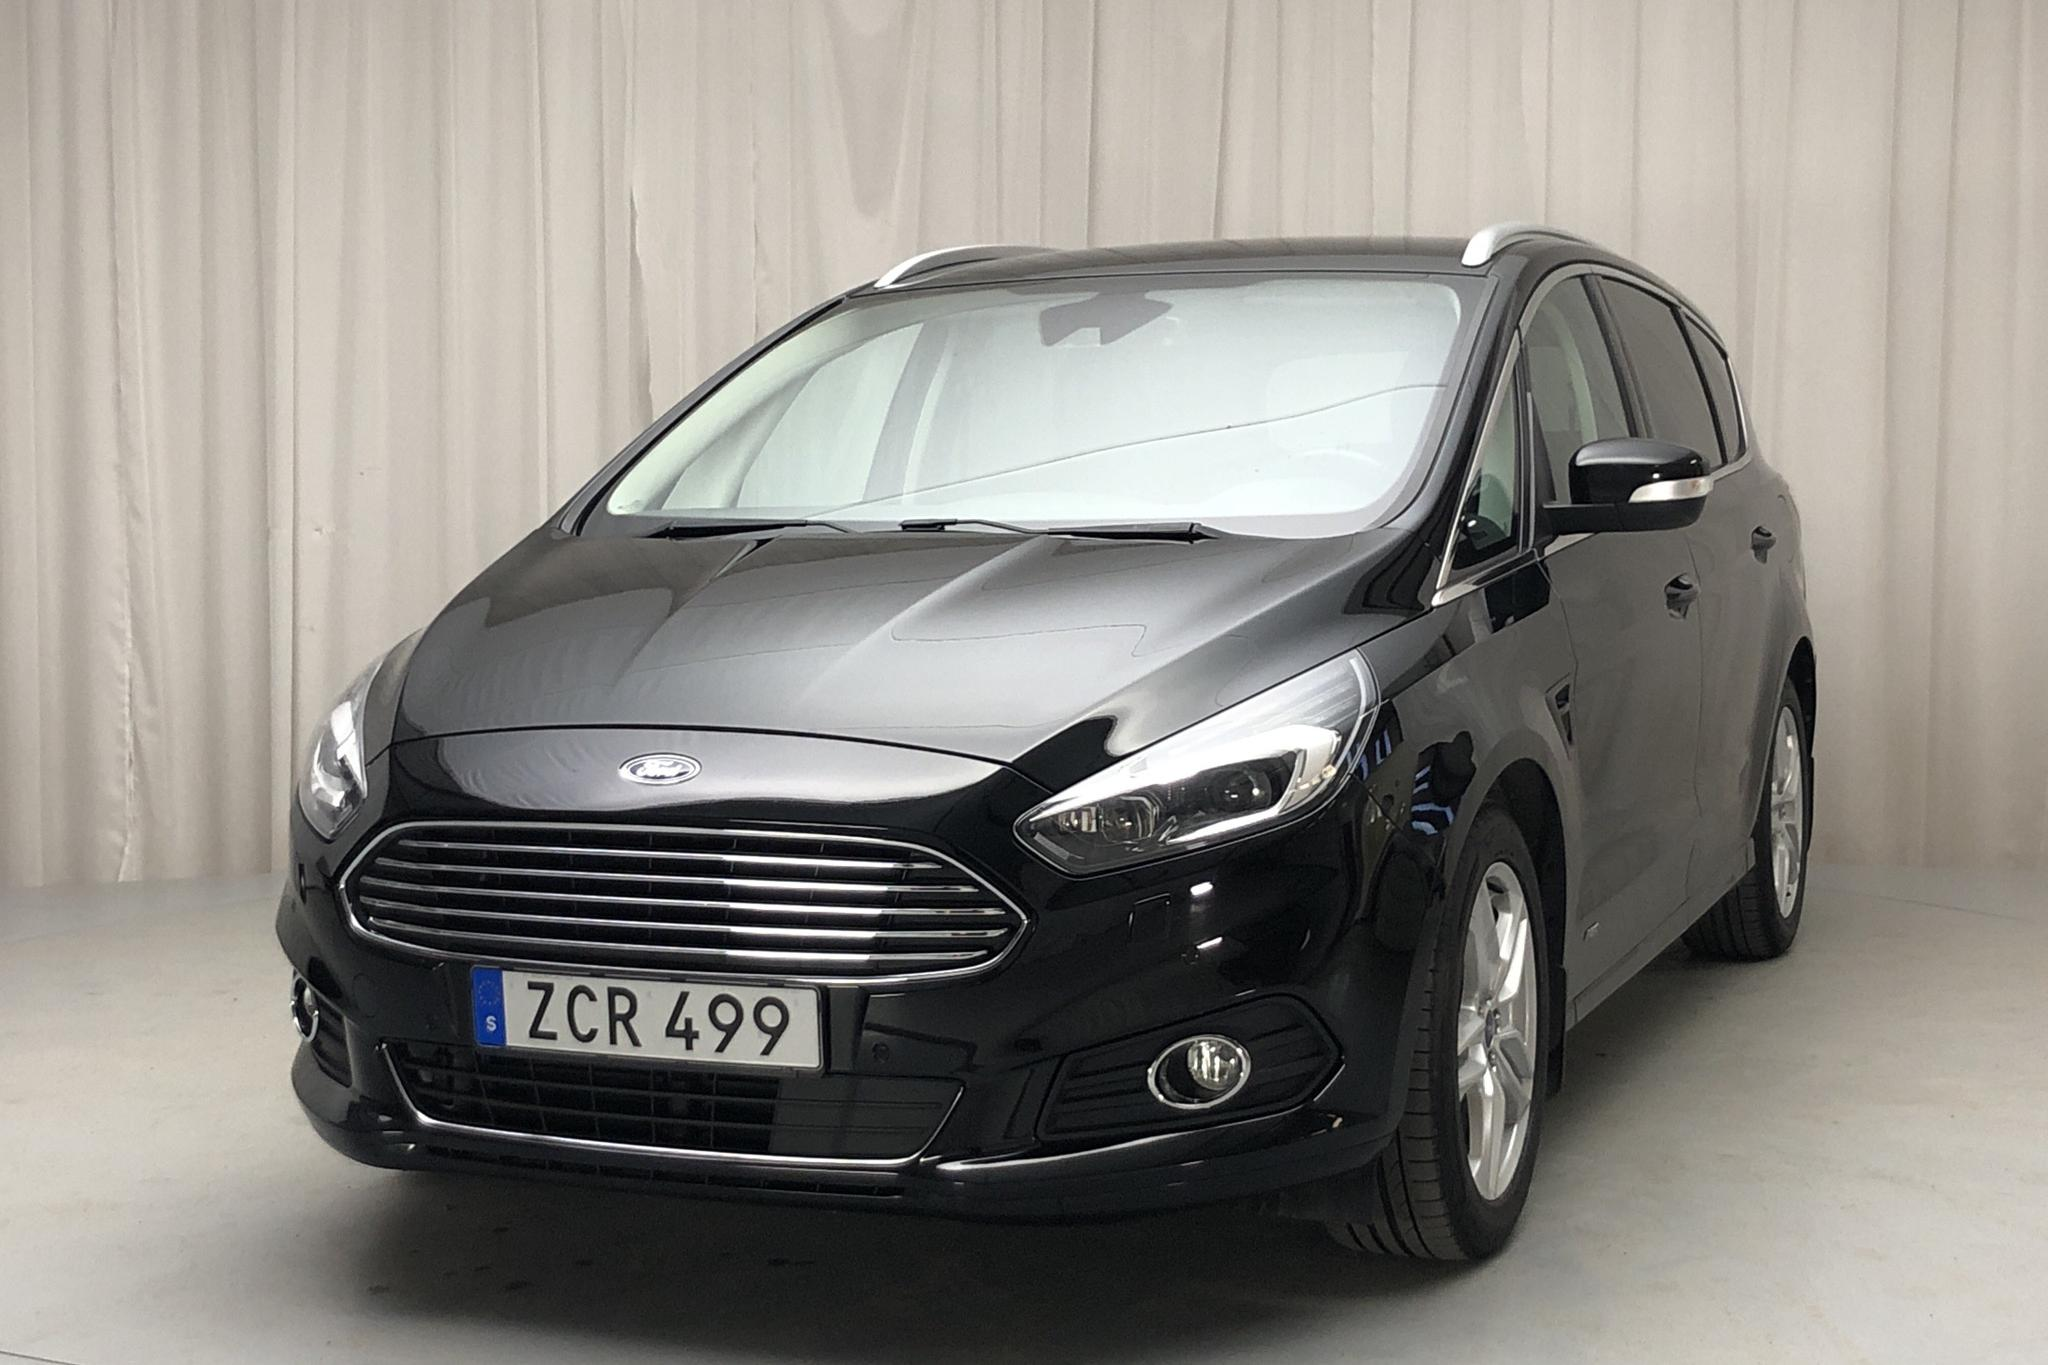 Ford S-MAX 2.0 TDCi AWD (180hk) - 62 290 km - Automatic - black - 2018